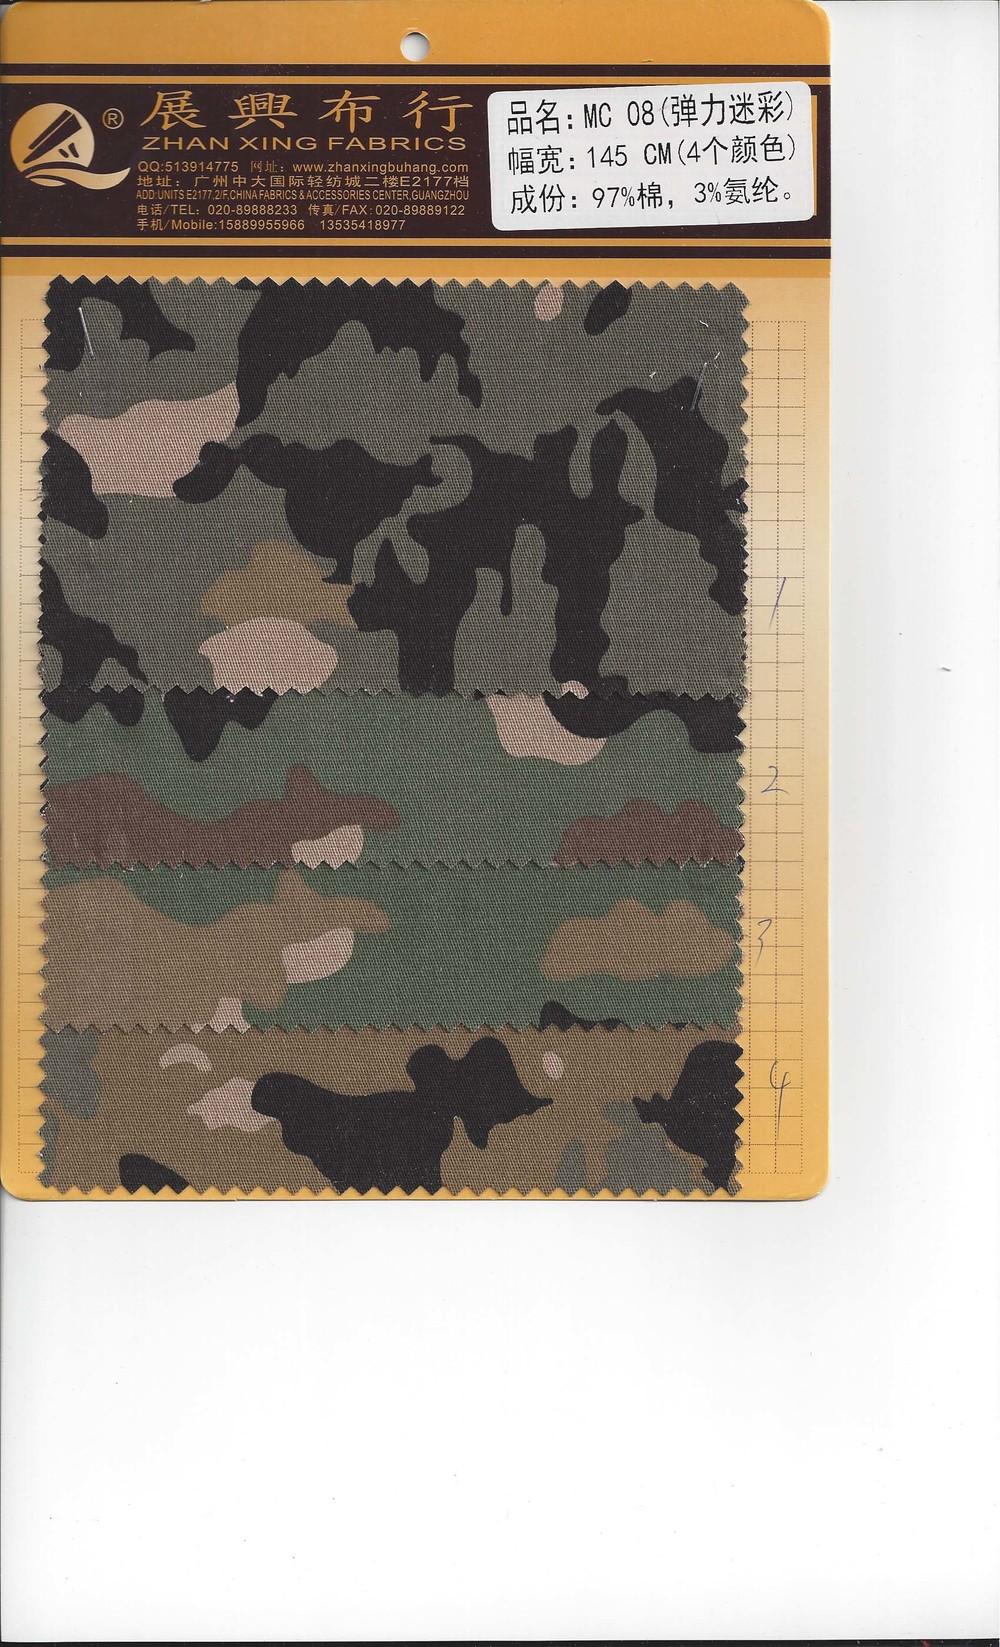 Zhan Xing Fabrics MC 08.jpg